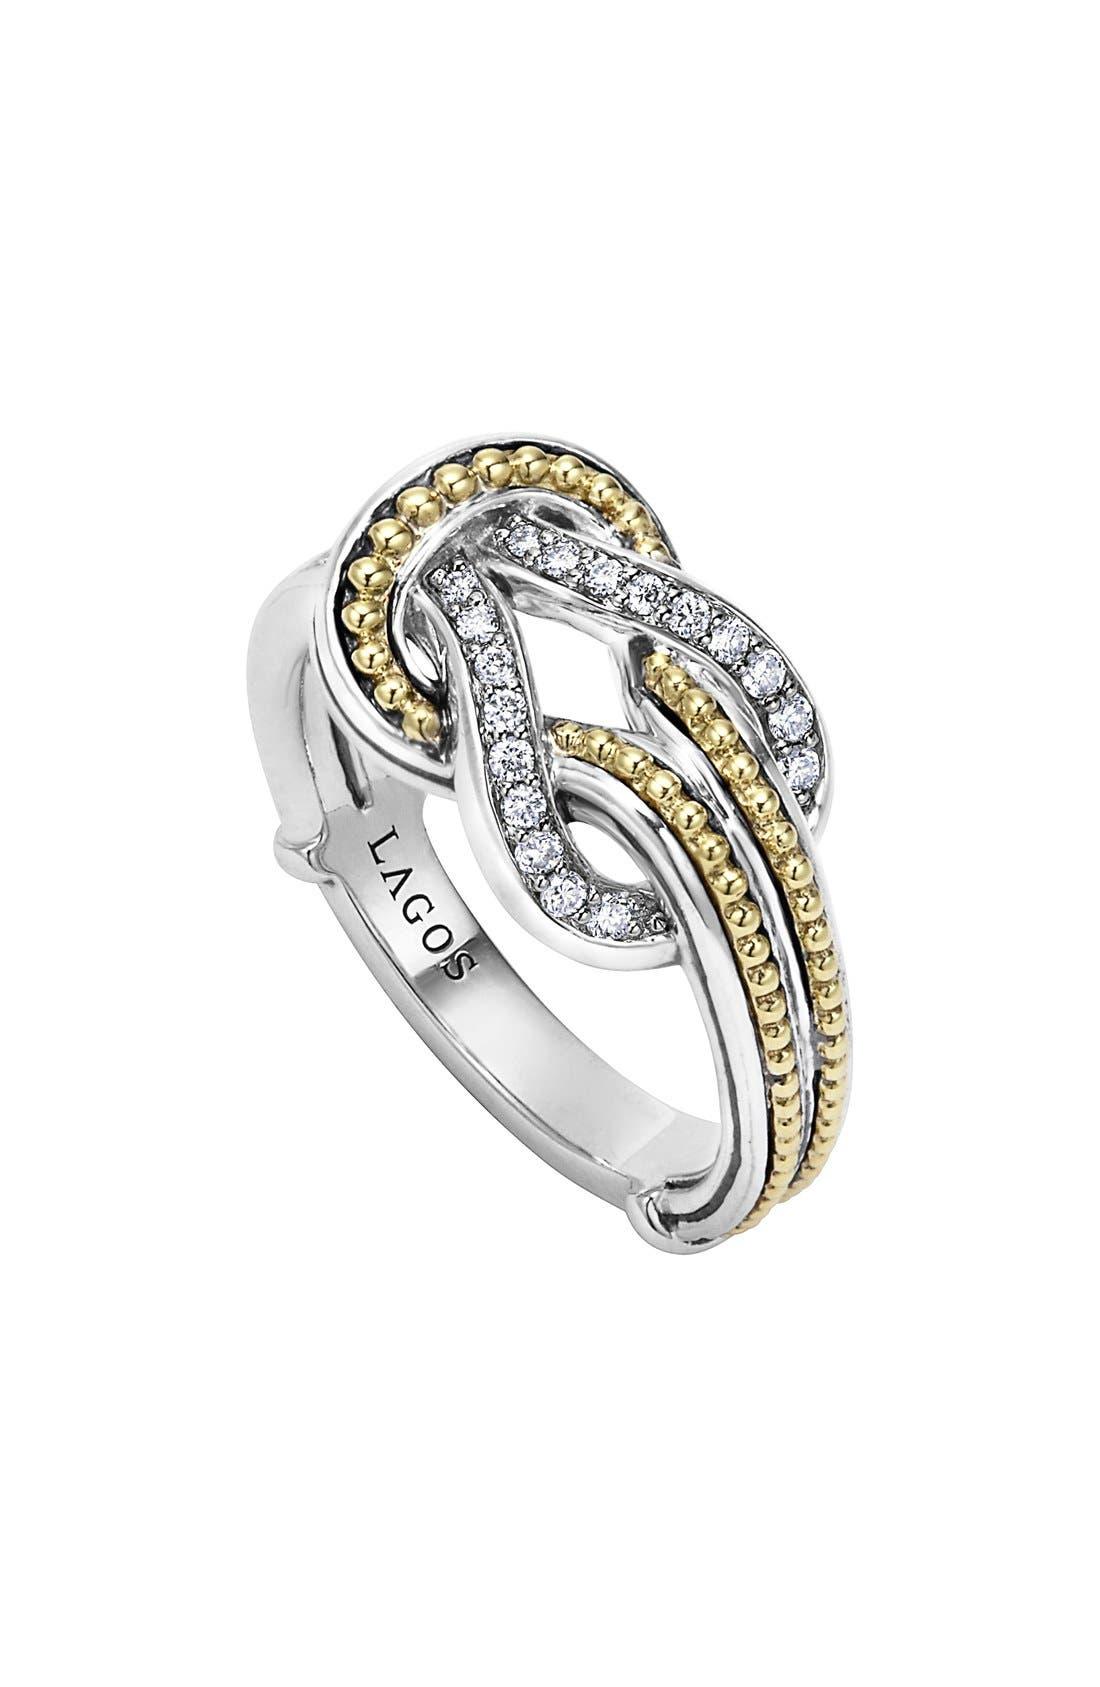 Main Image - LAGOS 'Newport' Diamond Knot Ring